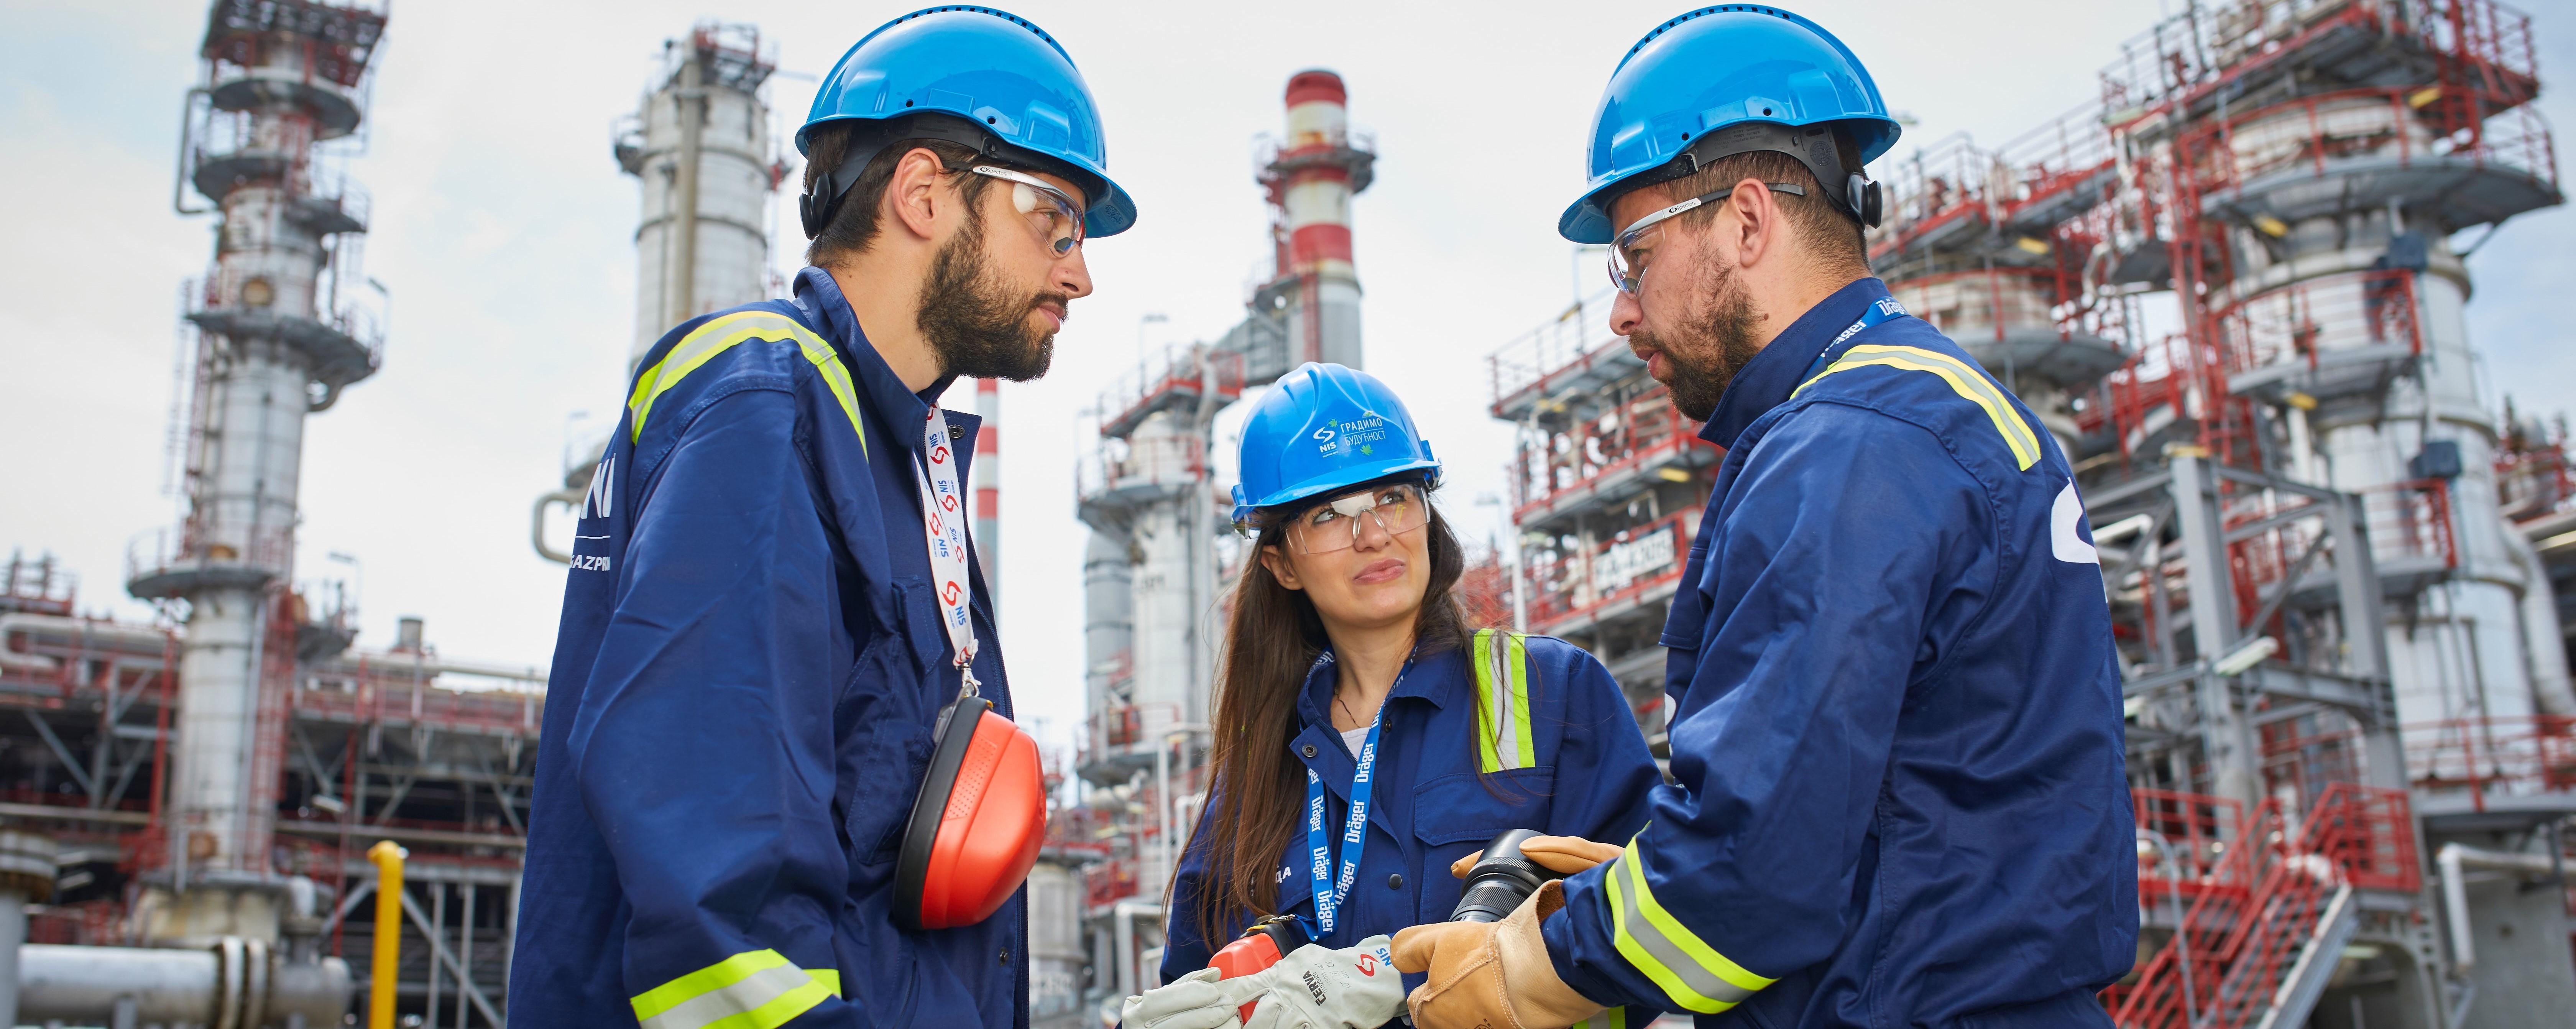 strucni nadzor, izgradnja, projekat, masinski nadzor, gradjevinski nadzor, project management, licence, inzenjeri